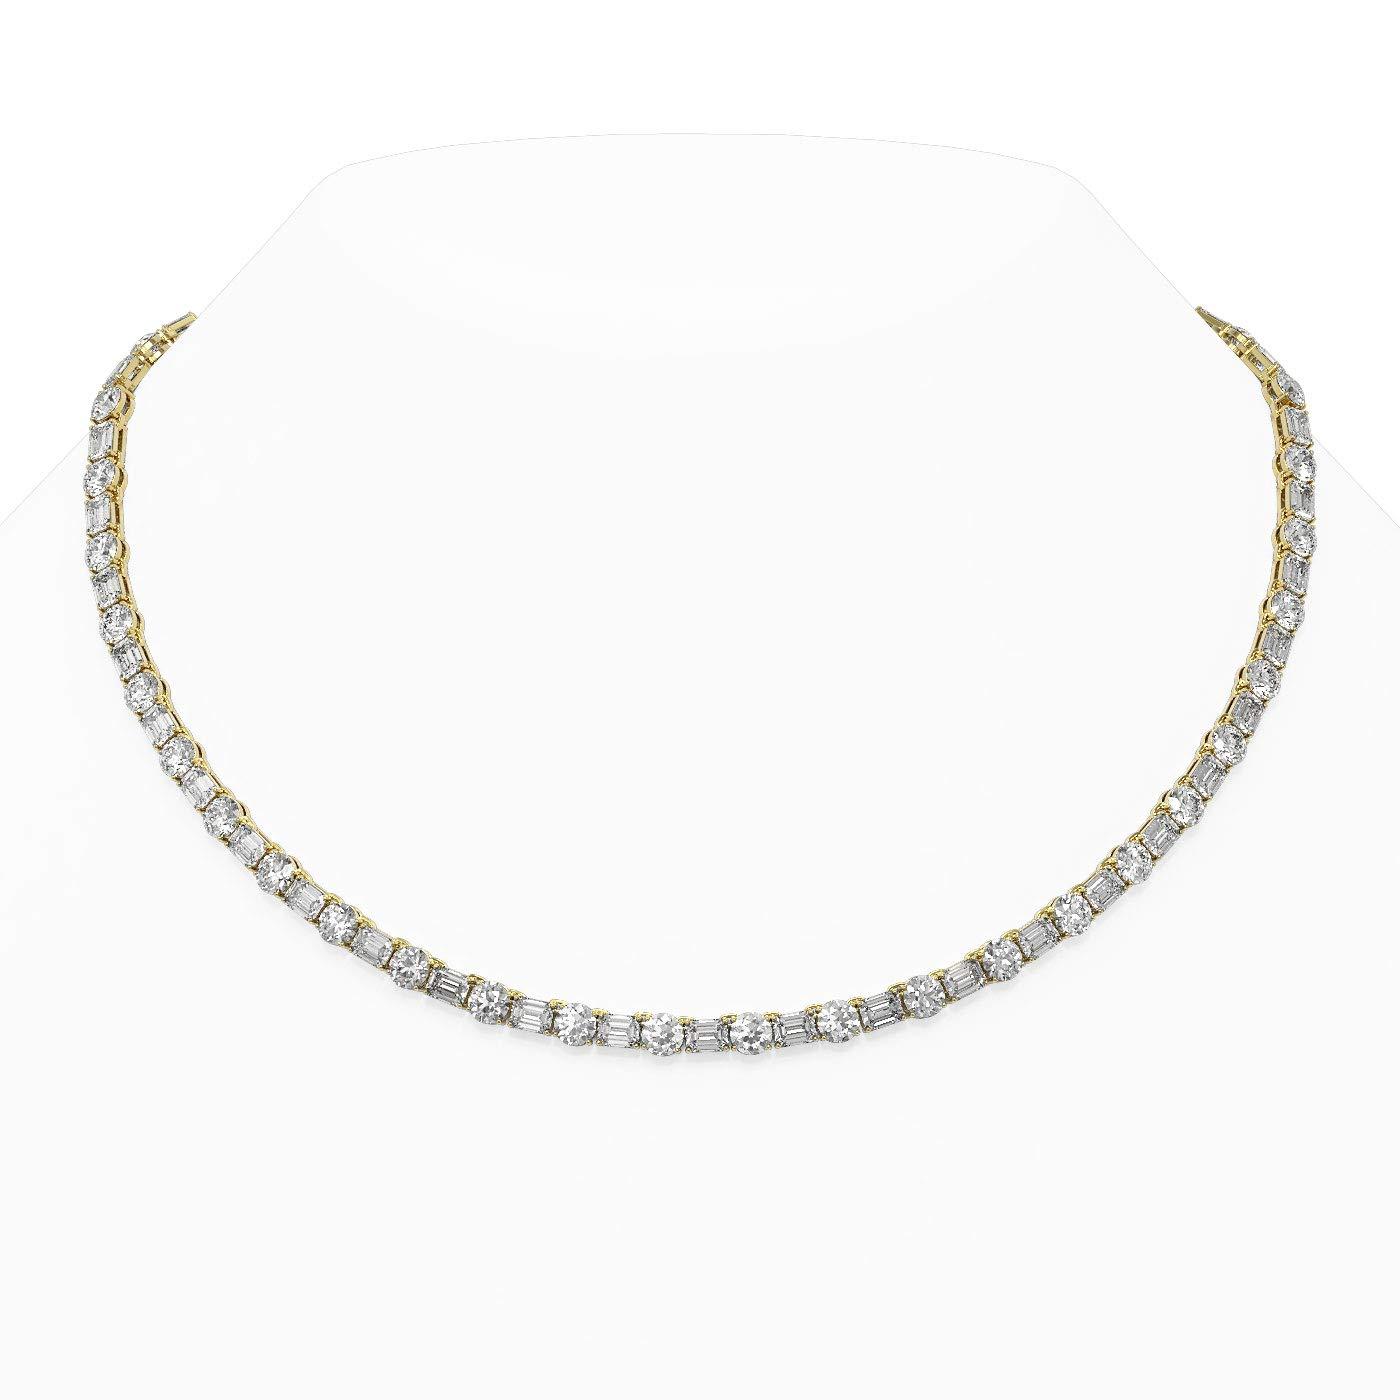 37 ctw Super intense SALE Emerald Cut Necklace 18K Diamond Designer specialty shop